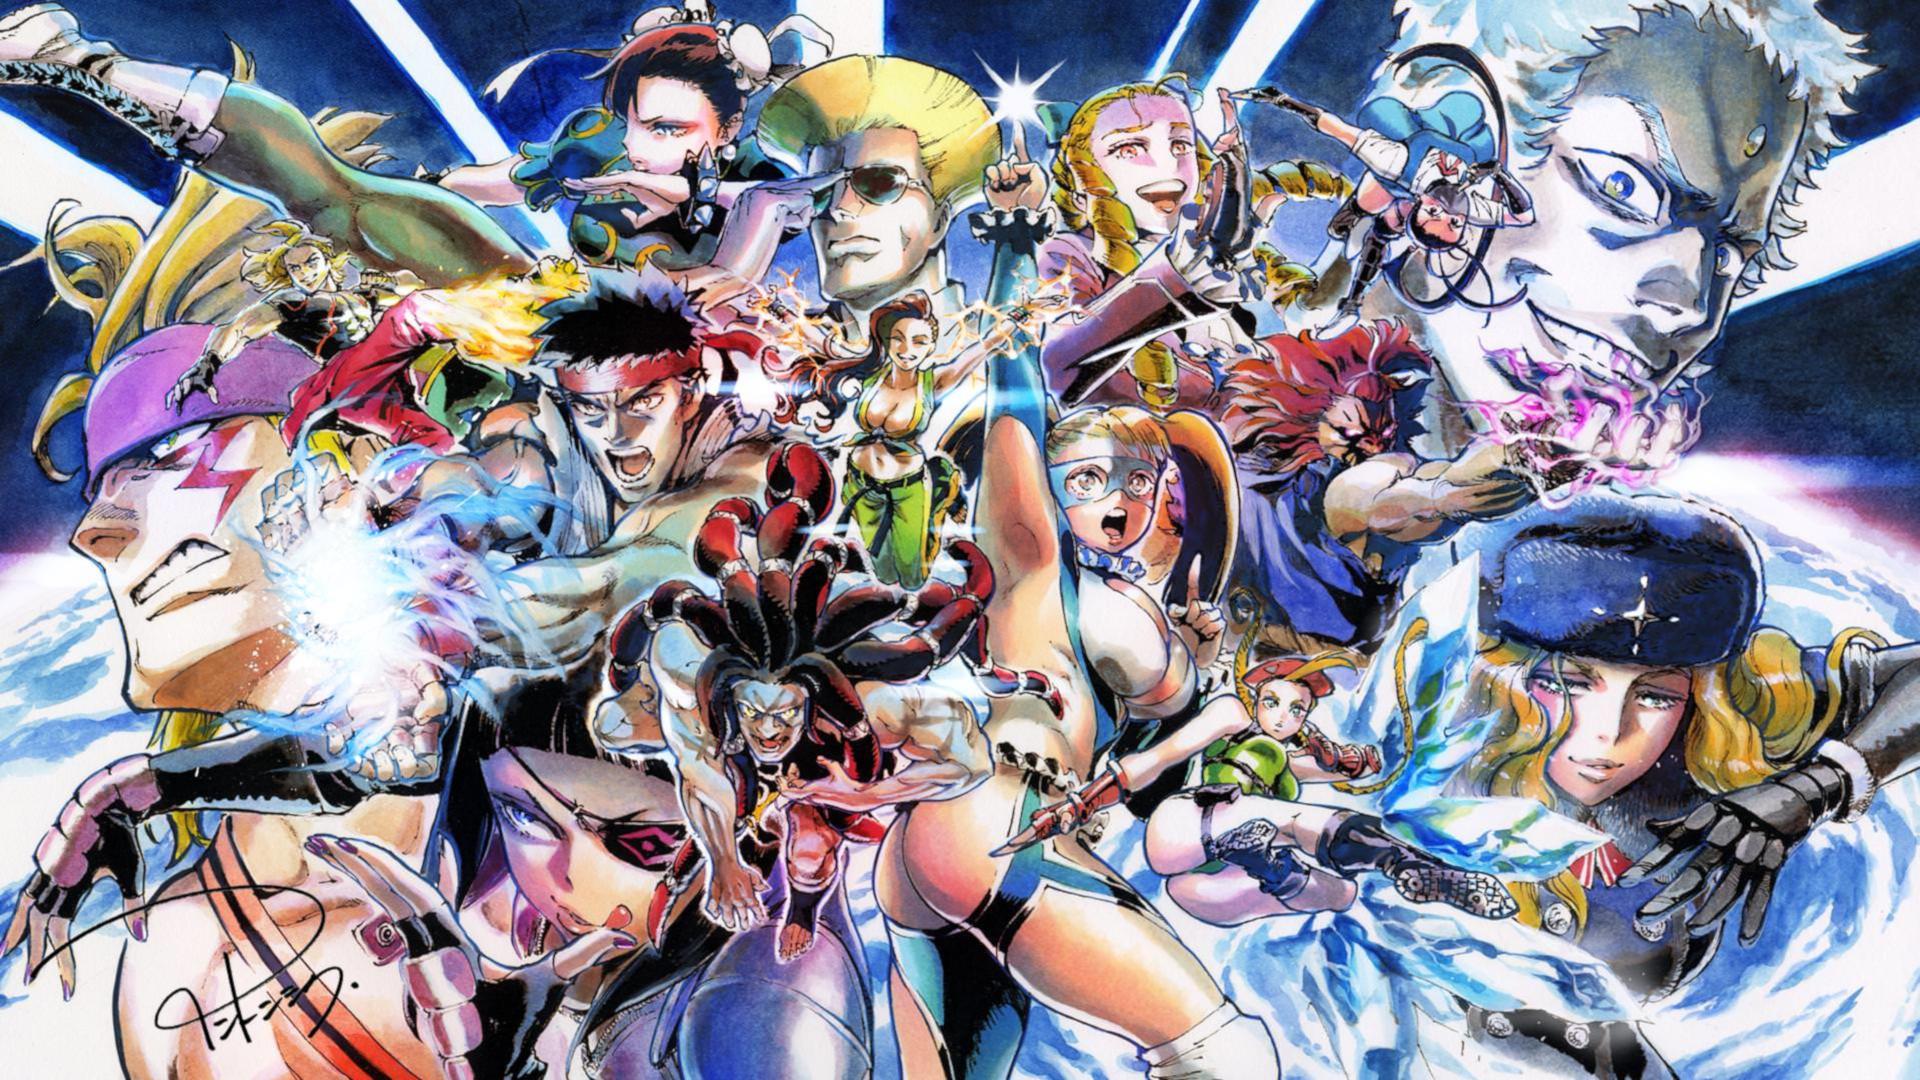 Street Fighter V Arcade Edition Details Launchbox Games Database